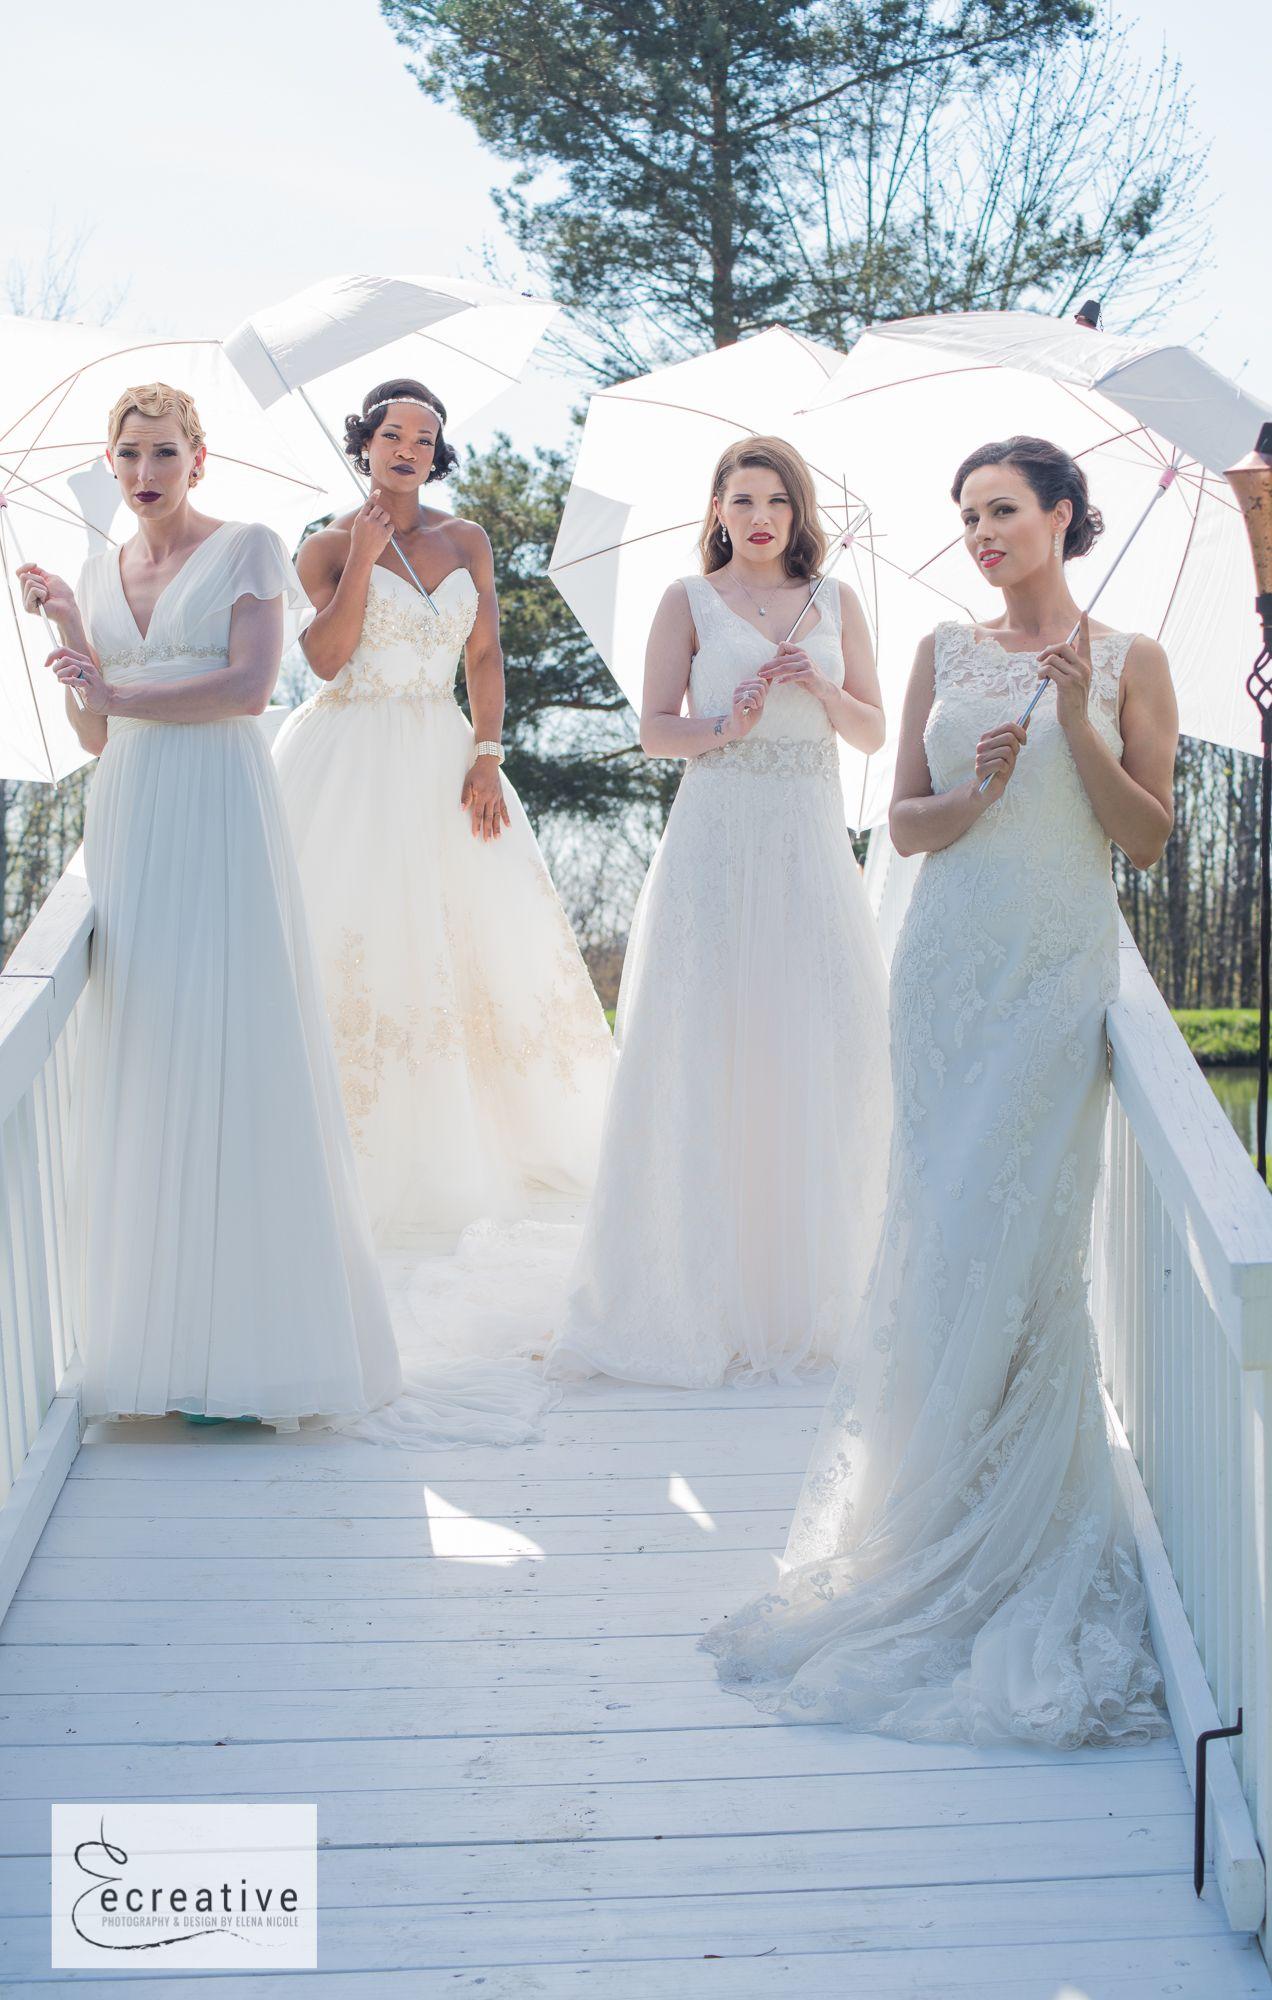 51ca0c6e981 Styled Bridal and formalwear shoot